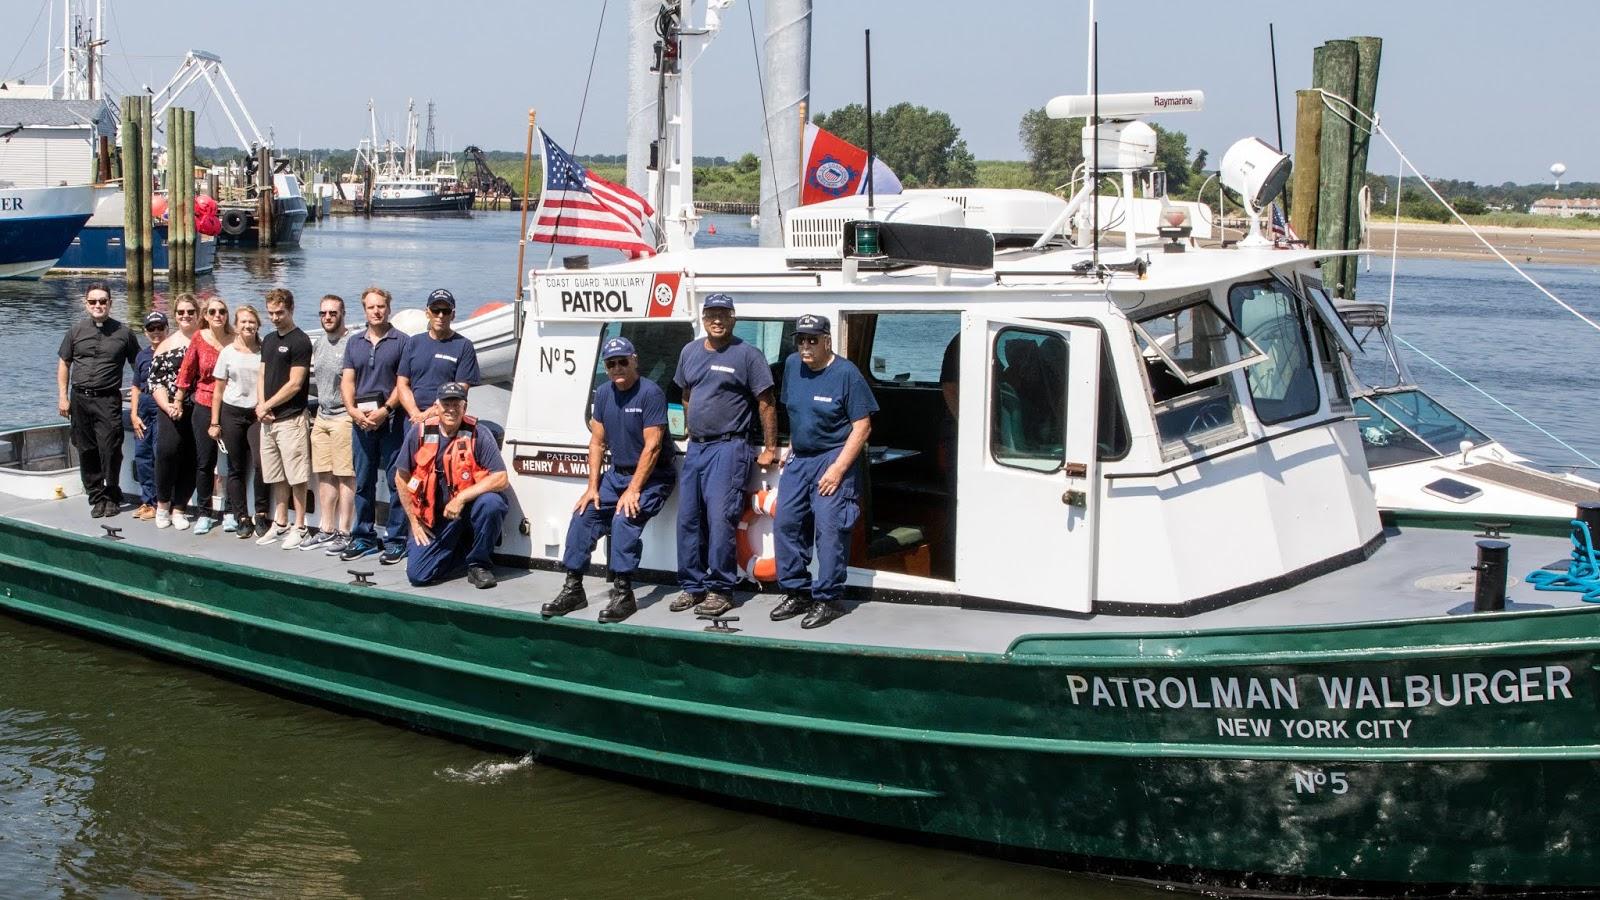 U S  Coast Guard Auxiliary Flotilla 16-07, D5NR: ARCHIVE 2018